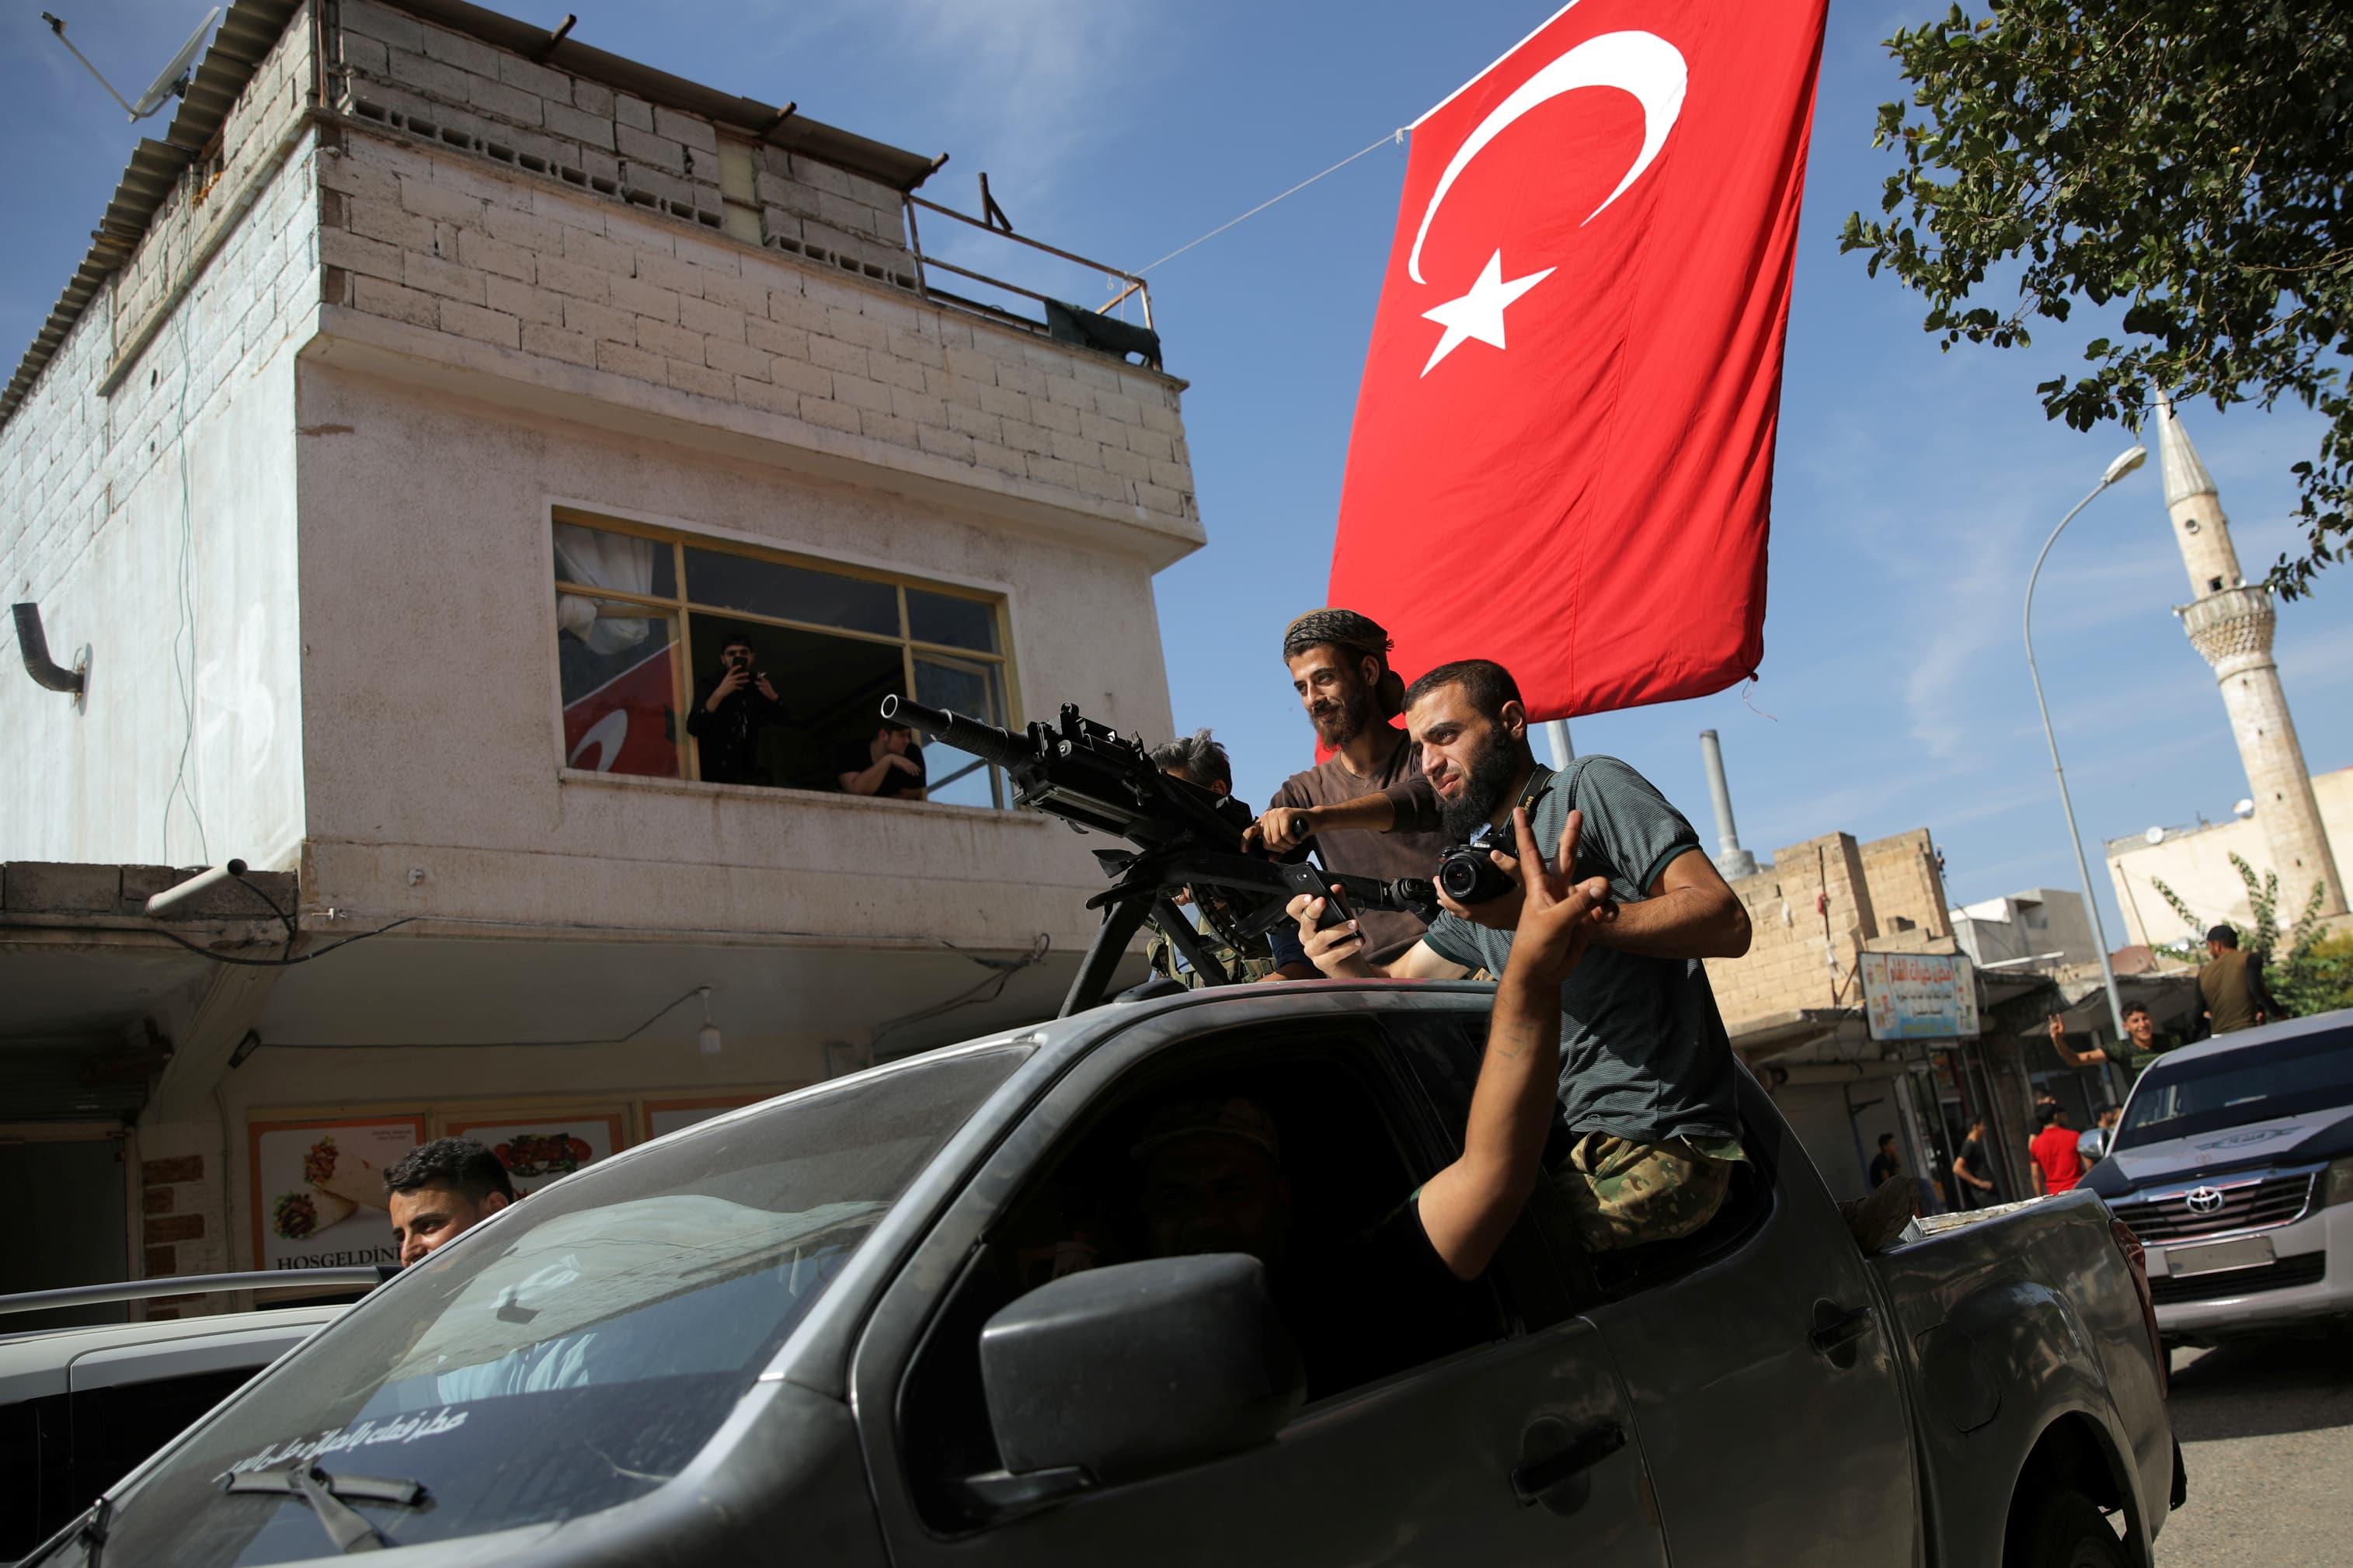 Turkish lira rises as markets don't take Trump's tariff threats seriously